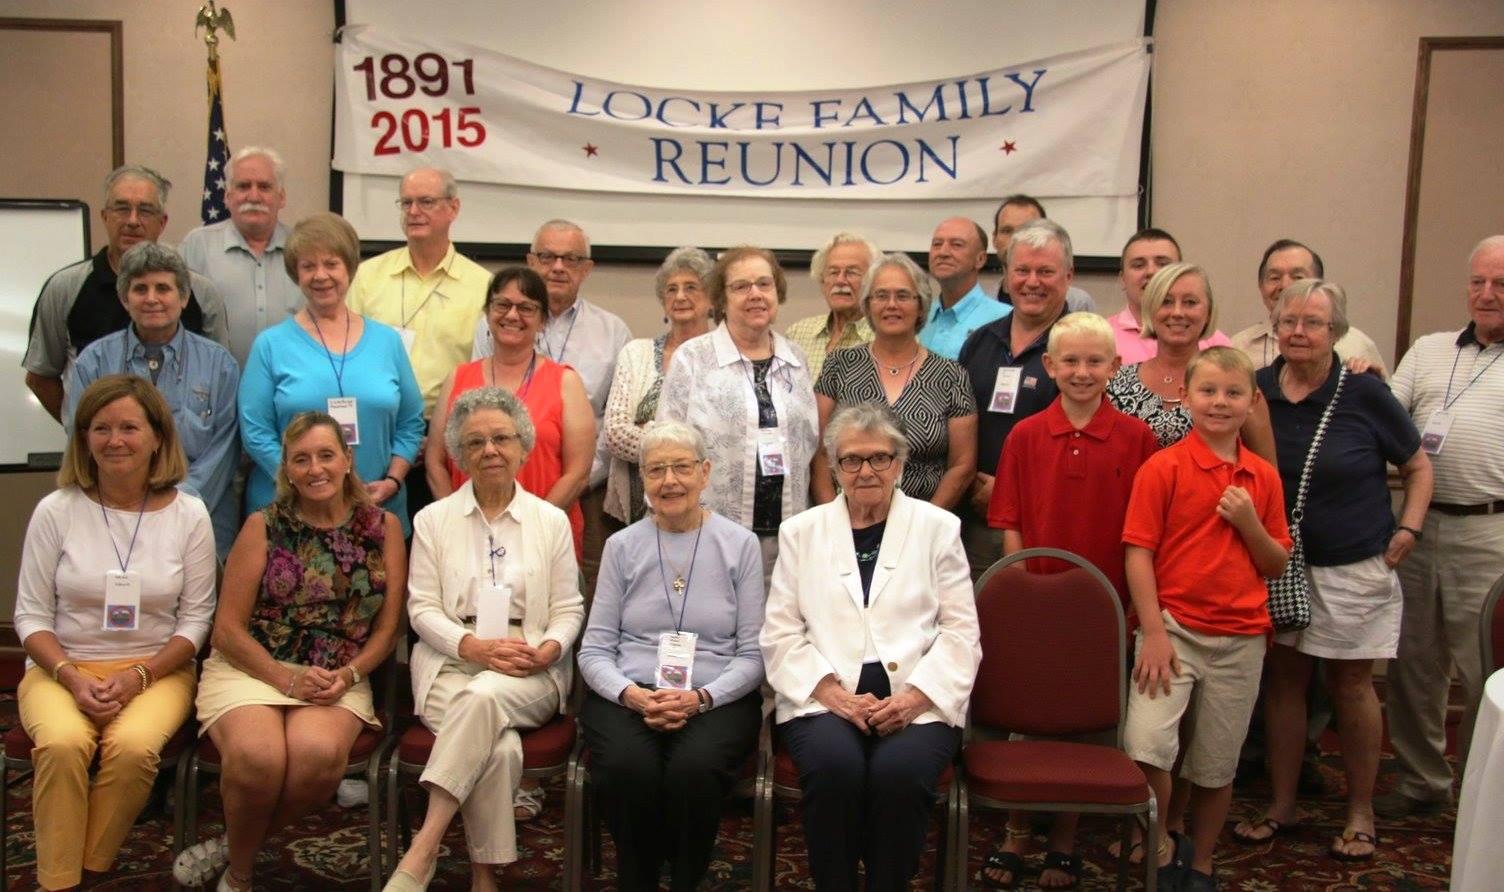 2015 Locke Family Association Reunion Portsmouth NH